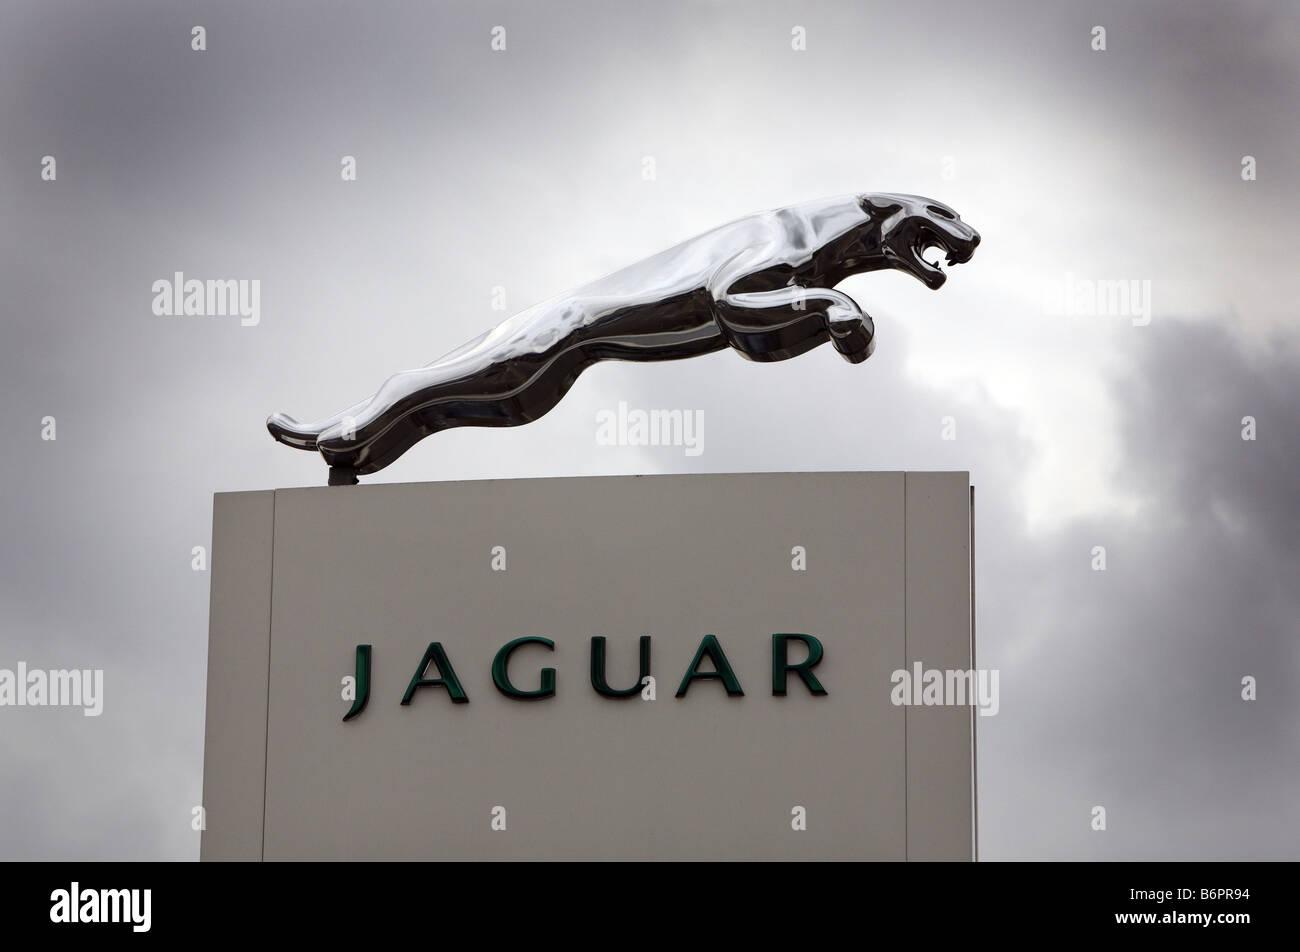 Jaguar car dealers showroom sign Stock Photo